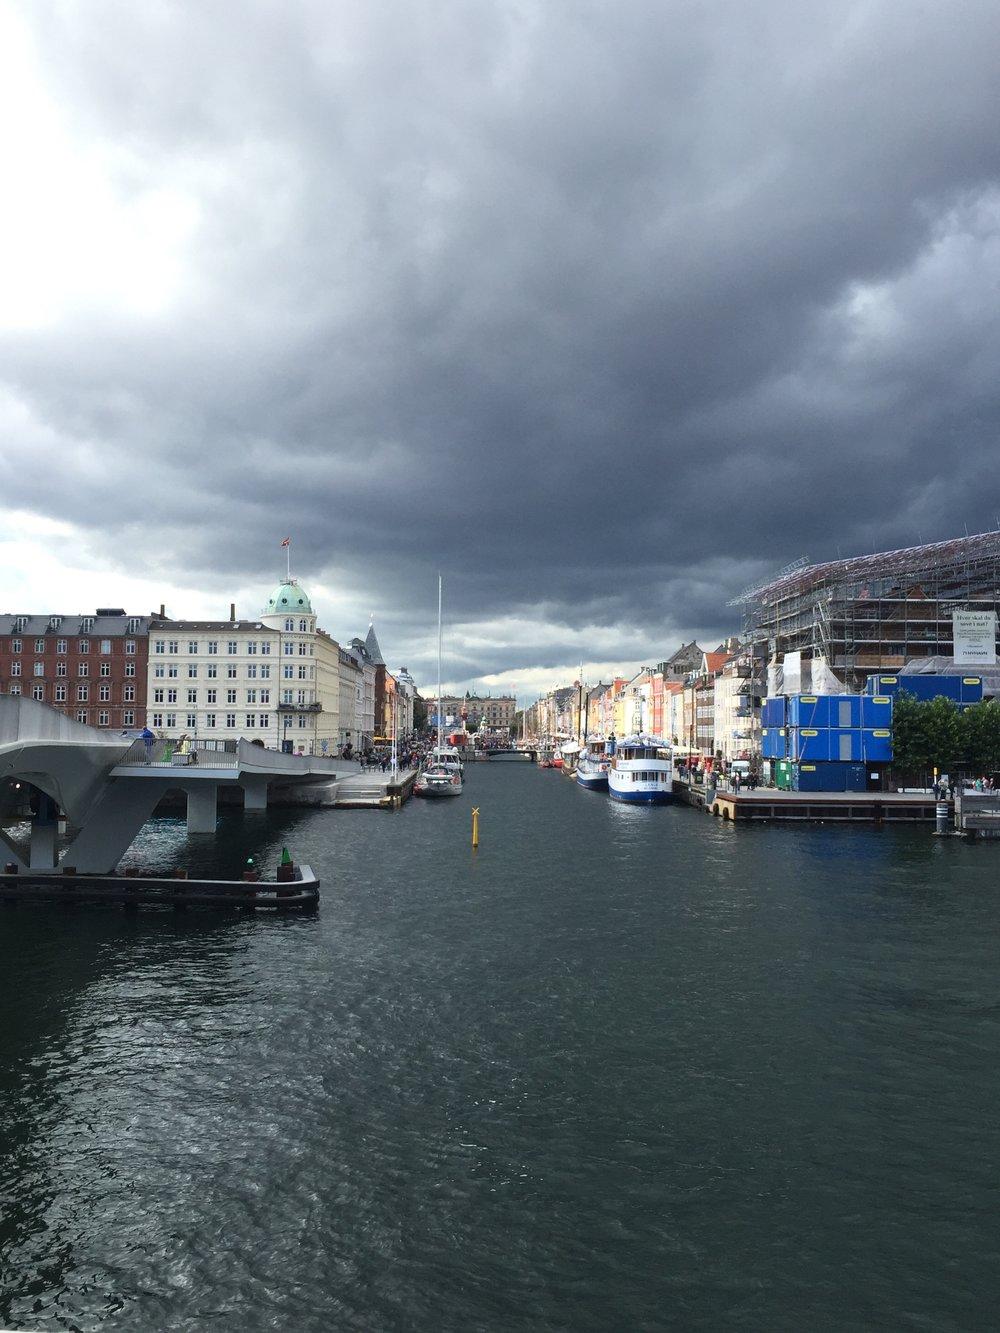 kobenhavn havn - largest seaport in Denmark.